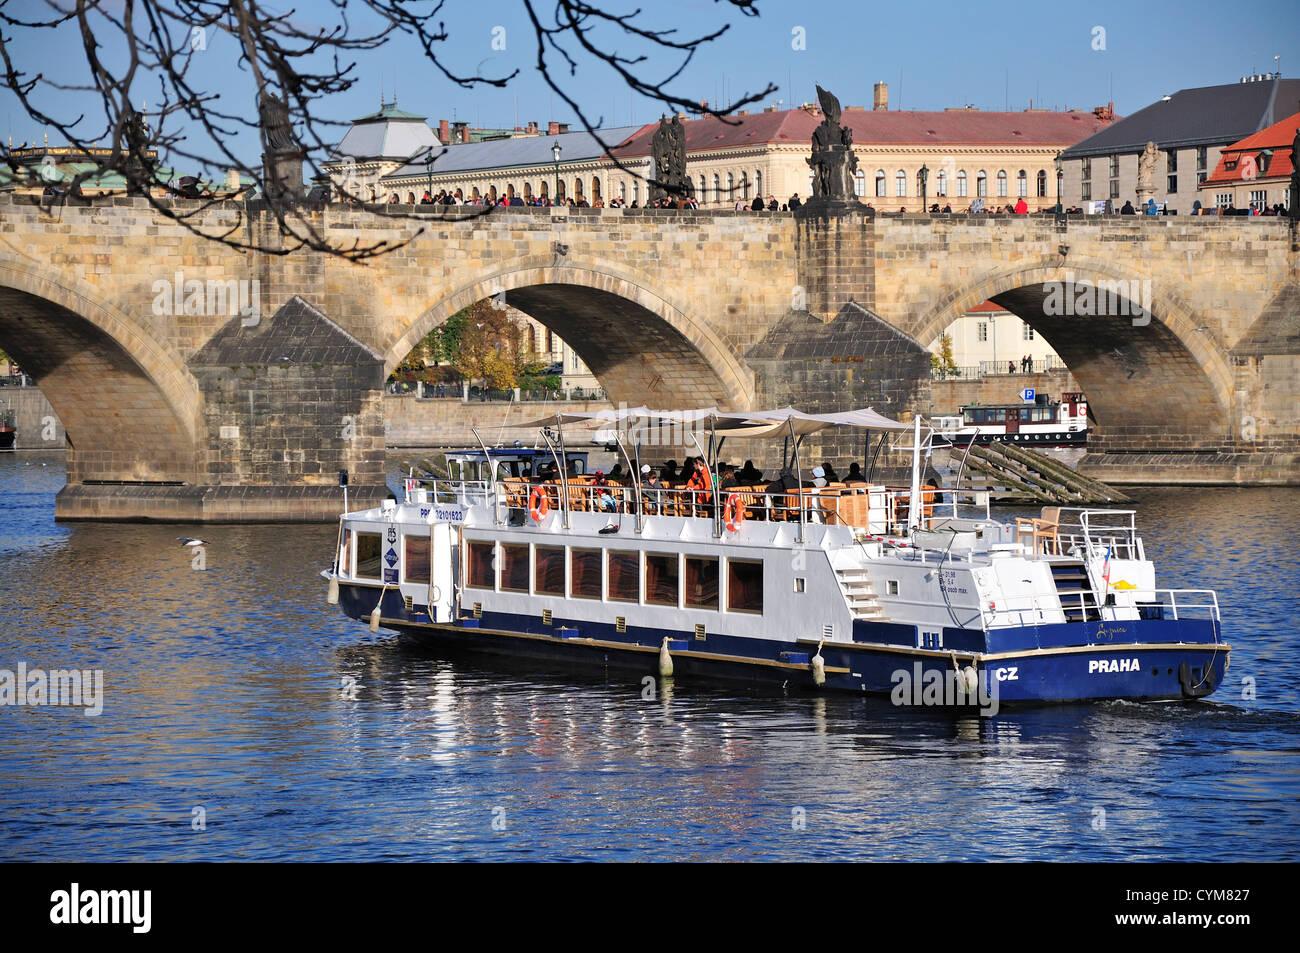 Prague, Czech Republic. Tourist boat on River Vltava (Moldau) - Charles Bridge - Stock Image